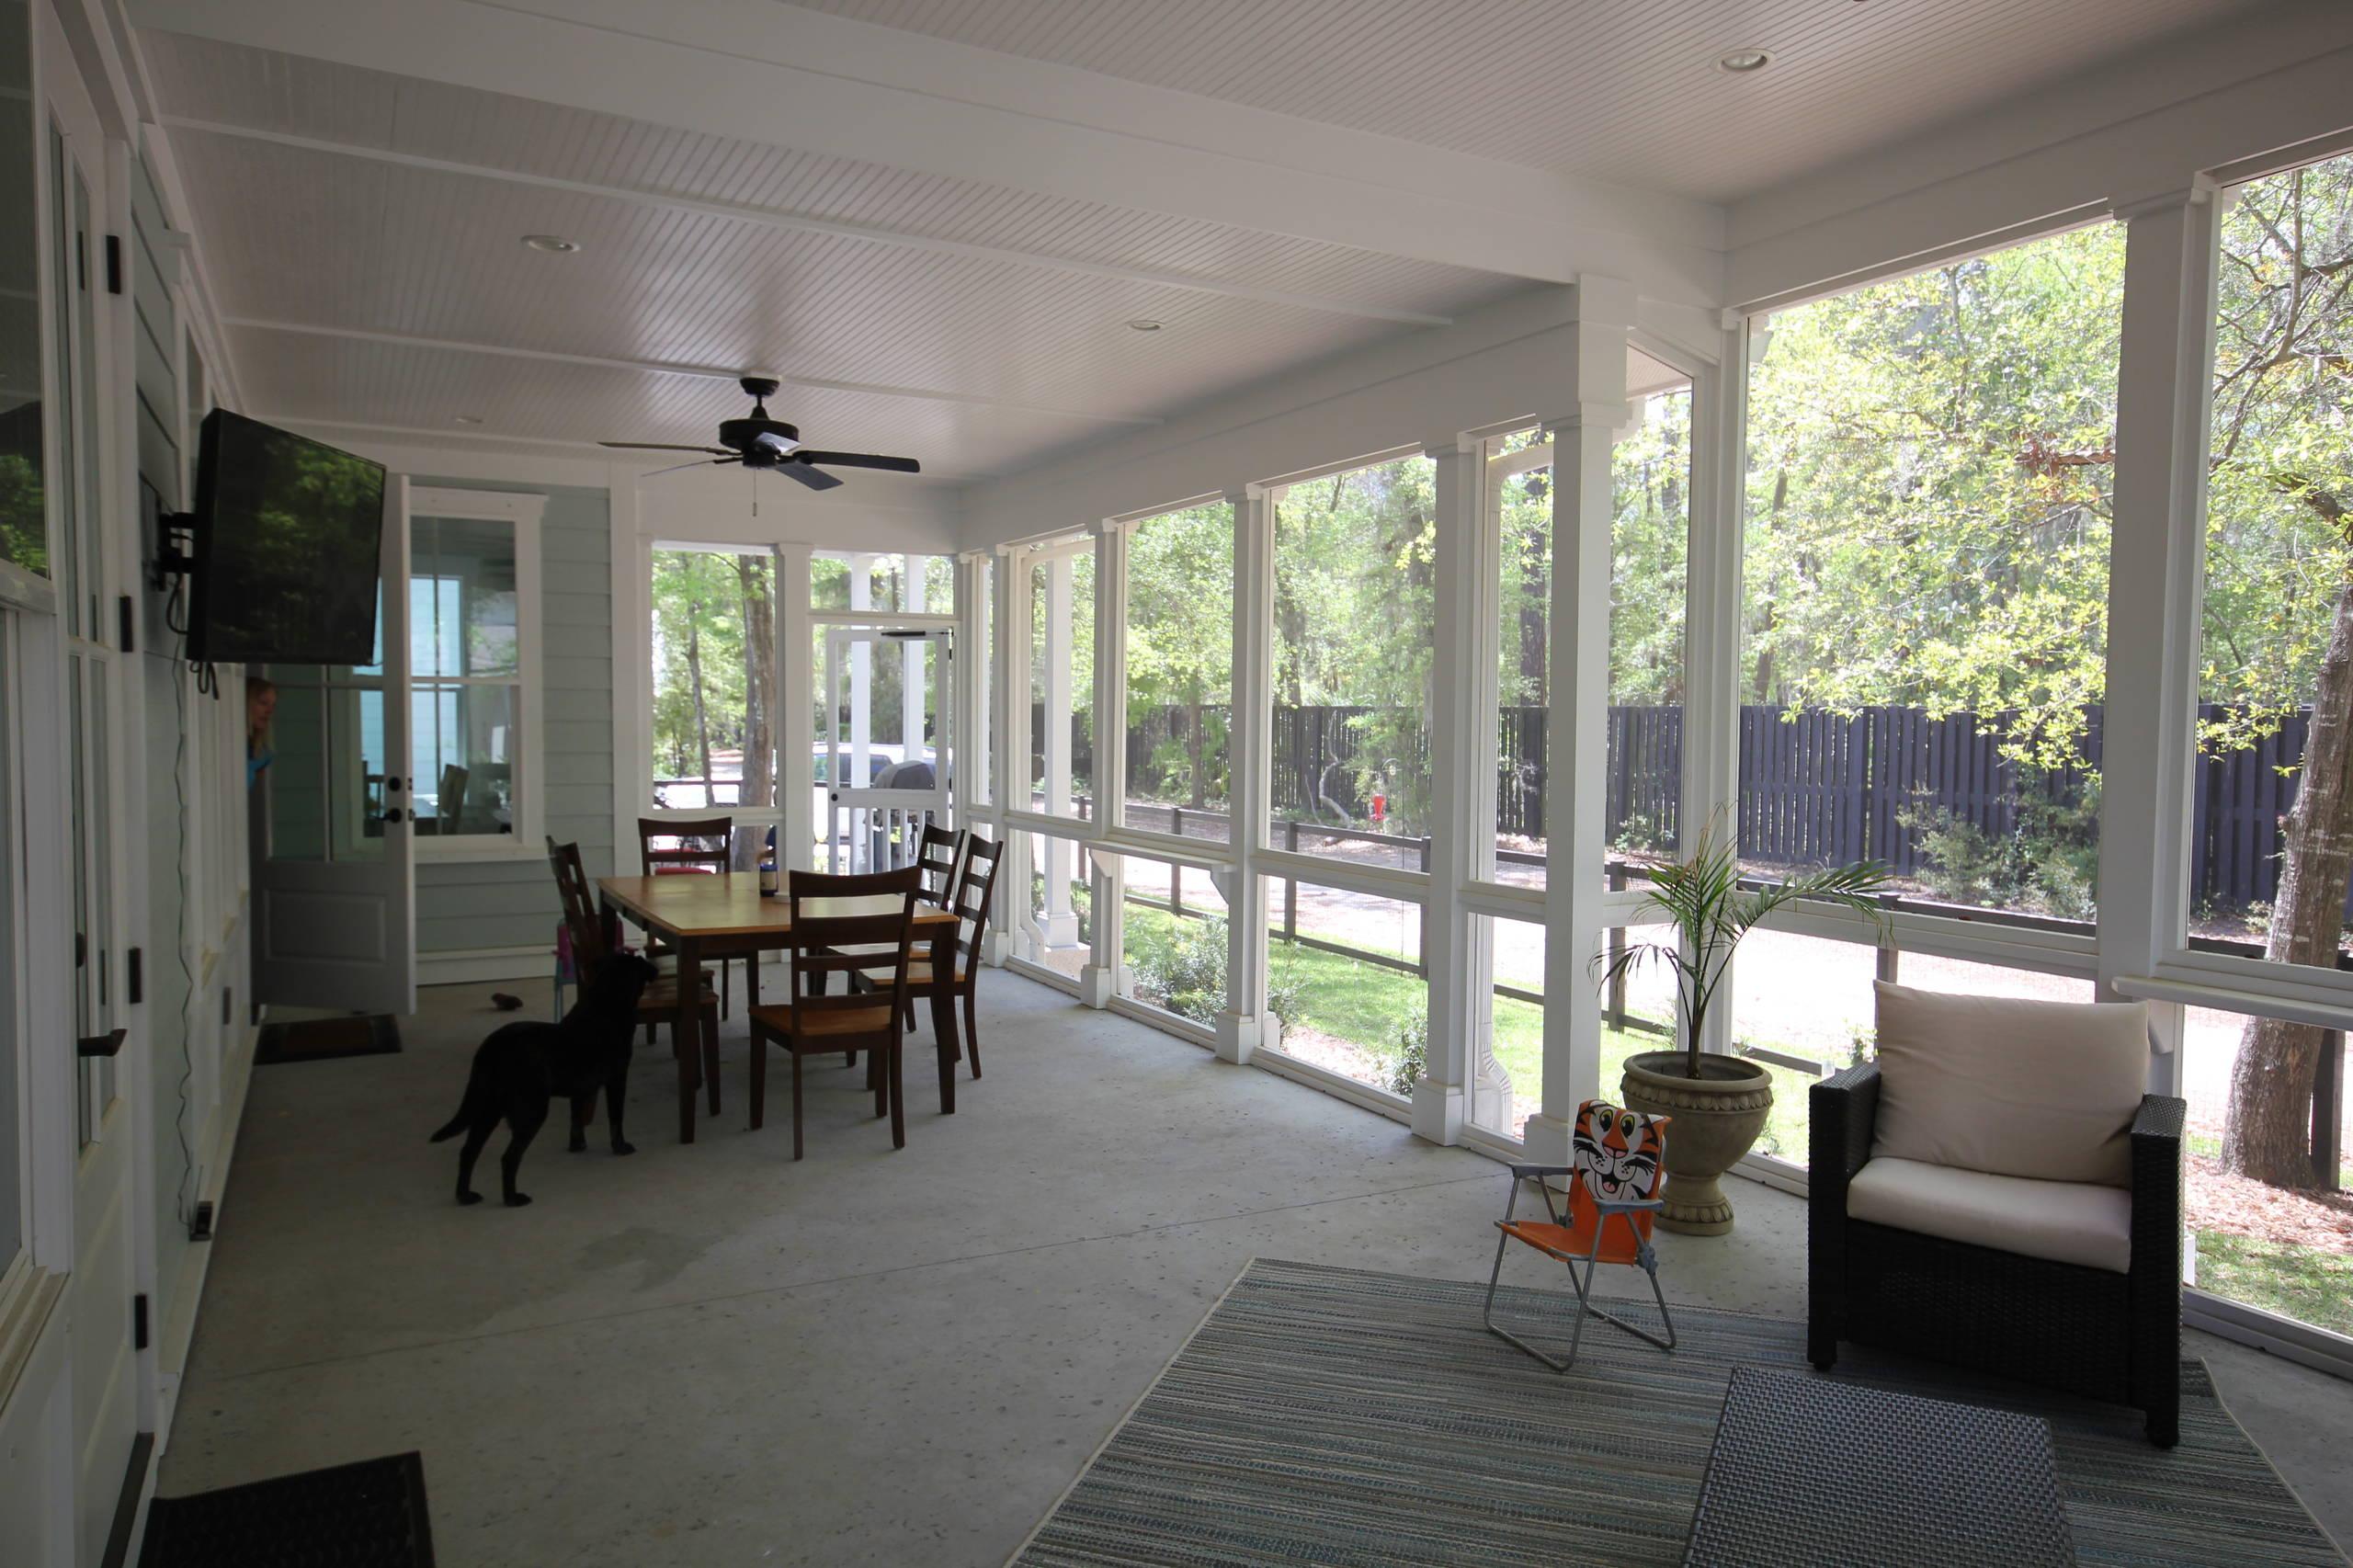 New Home Build in Stock Farm